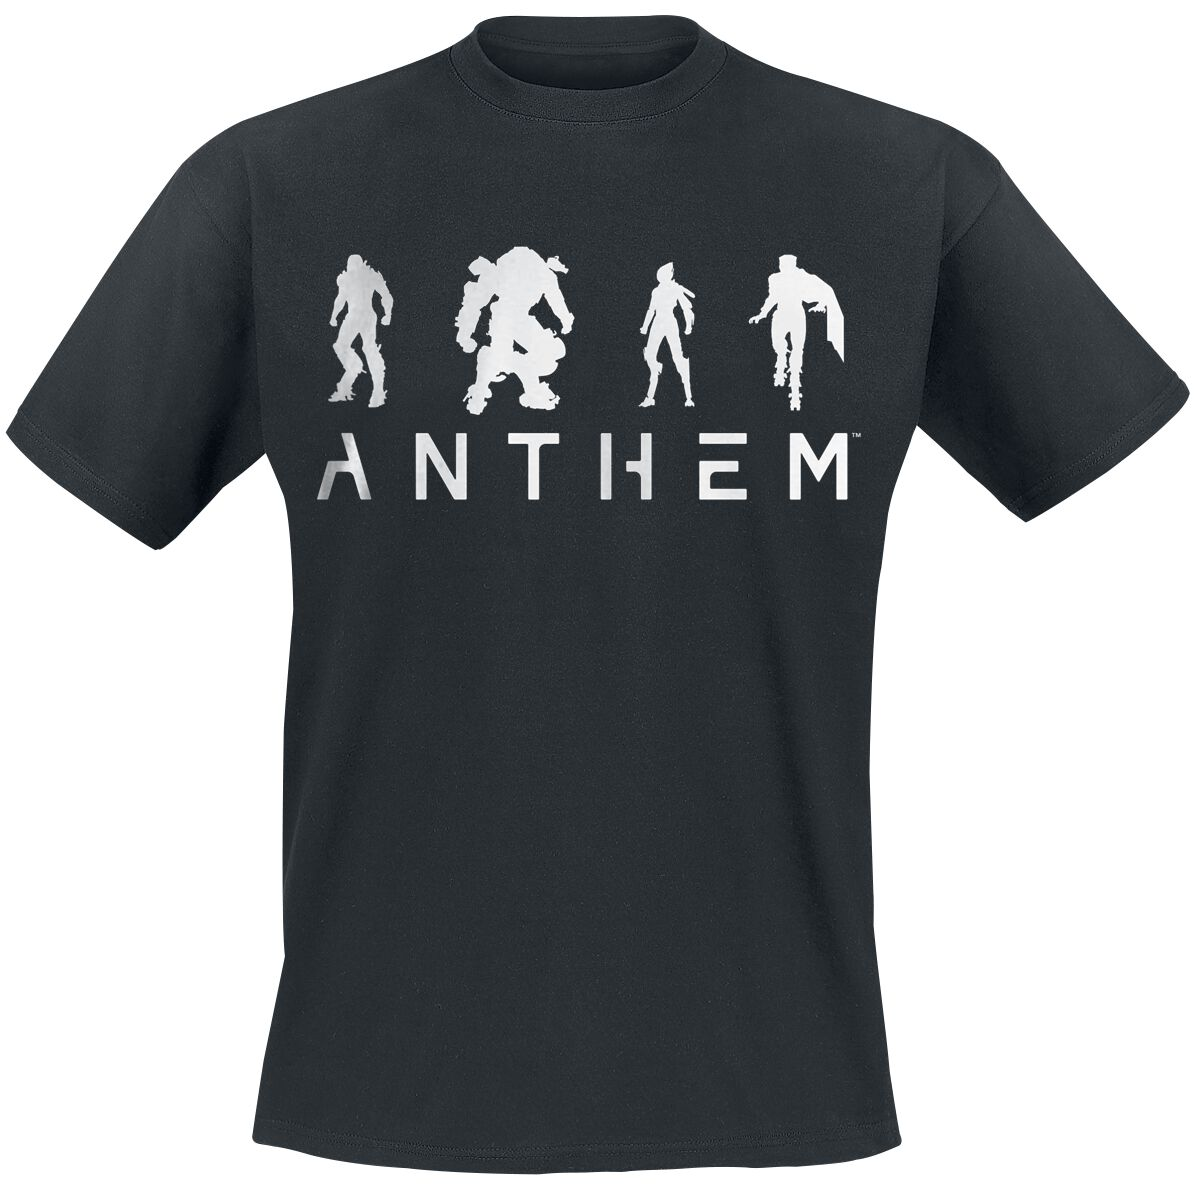 Image of Anthem White Out T-Shirt schwarz